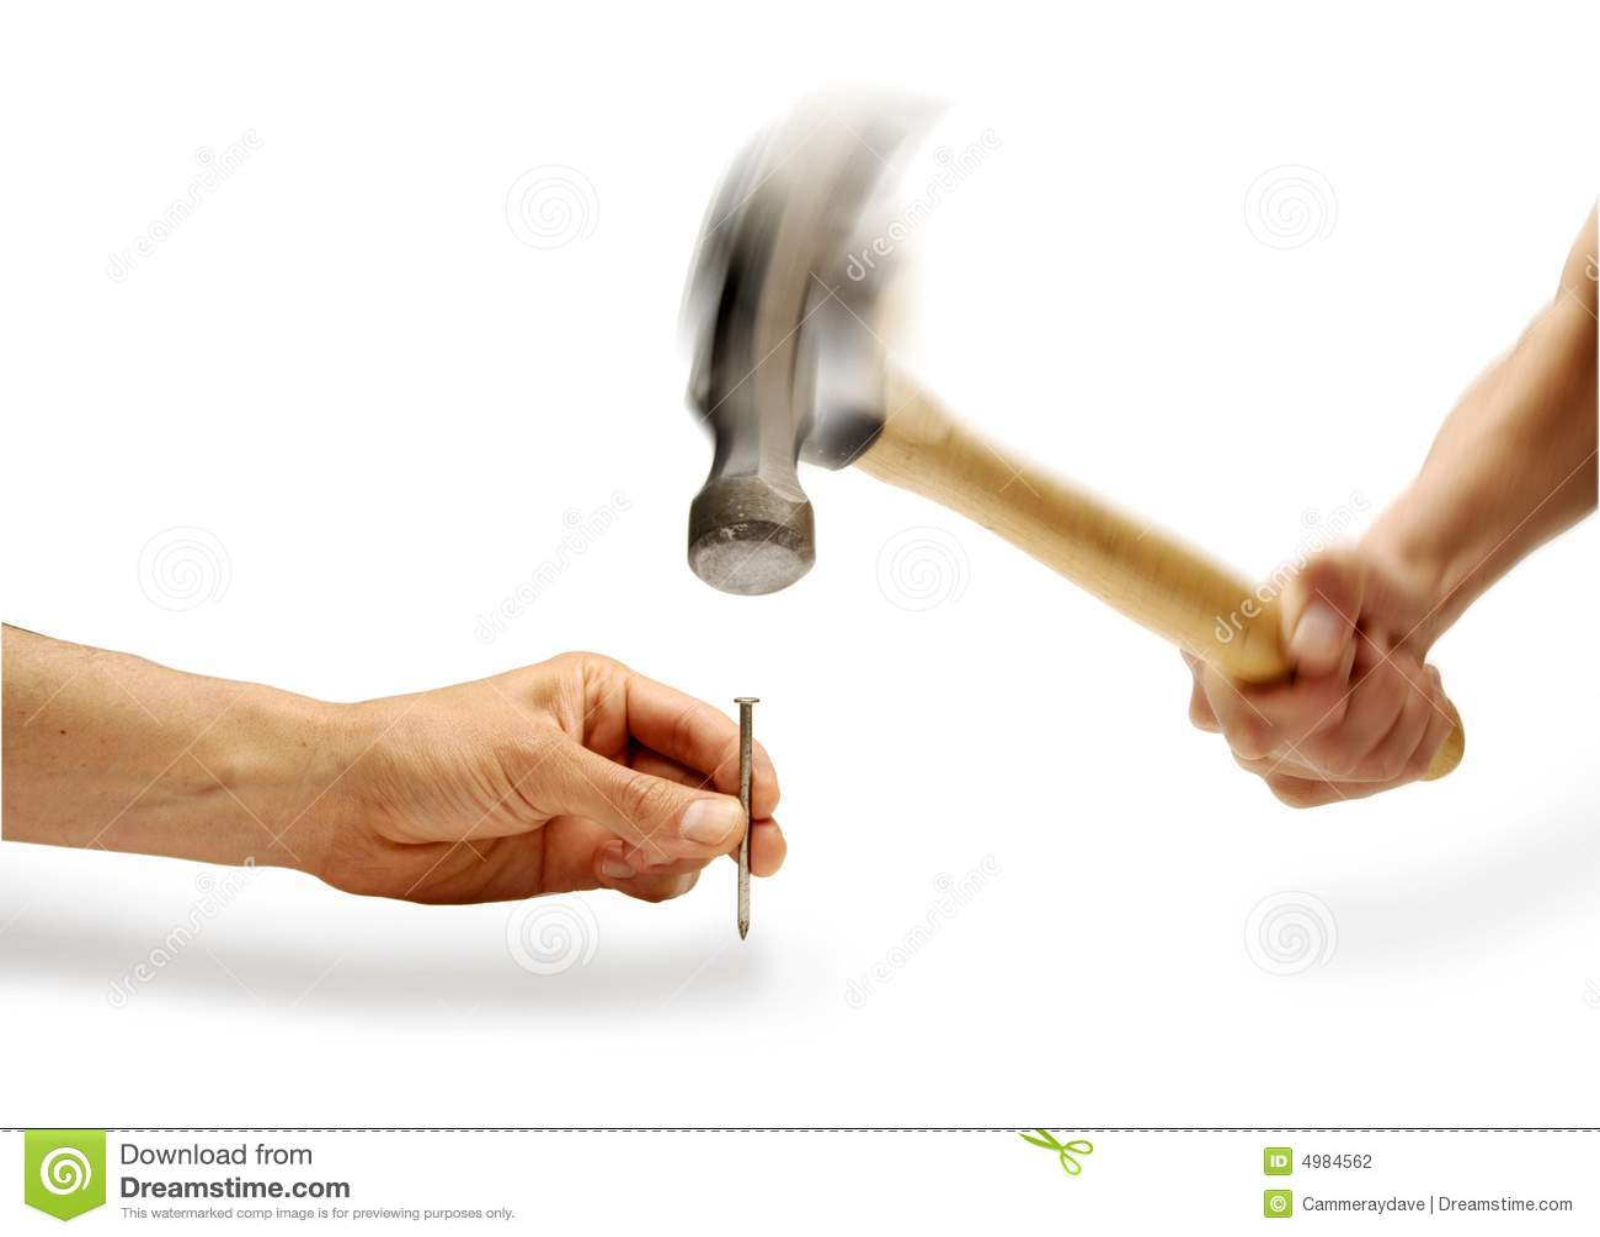 hammer hand nail holding stock photo image of swinging